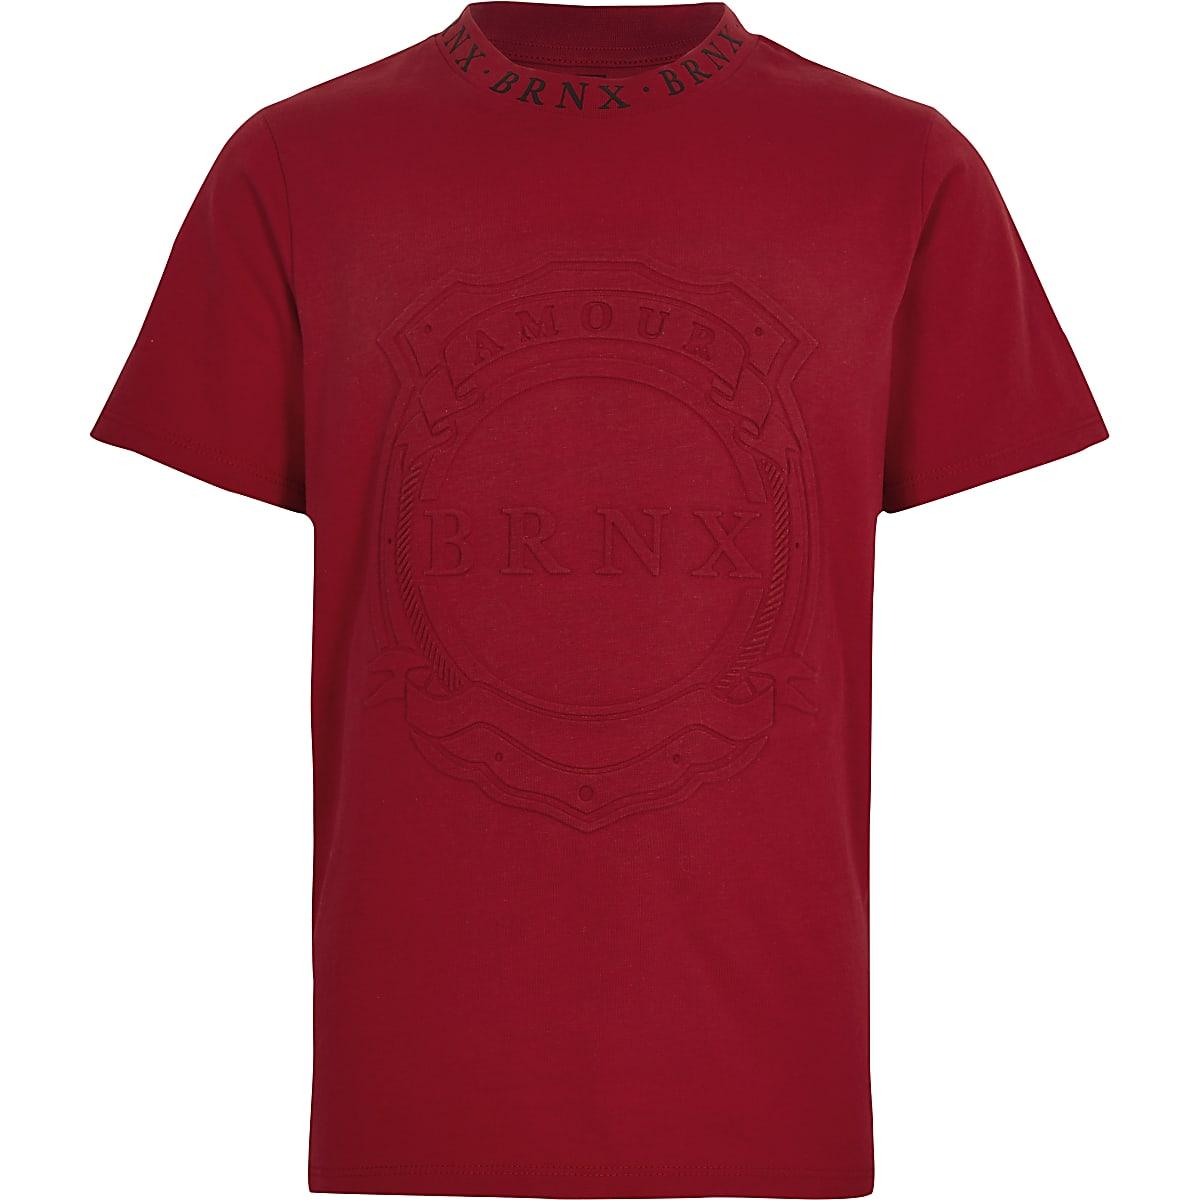 Boys red 'Brnx' short sleeve T-shirt